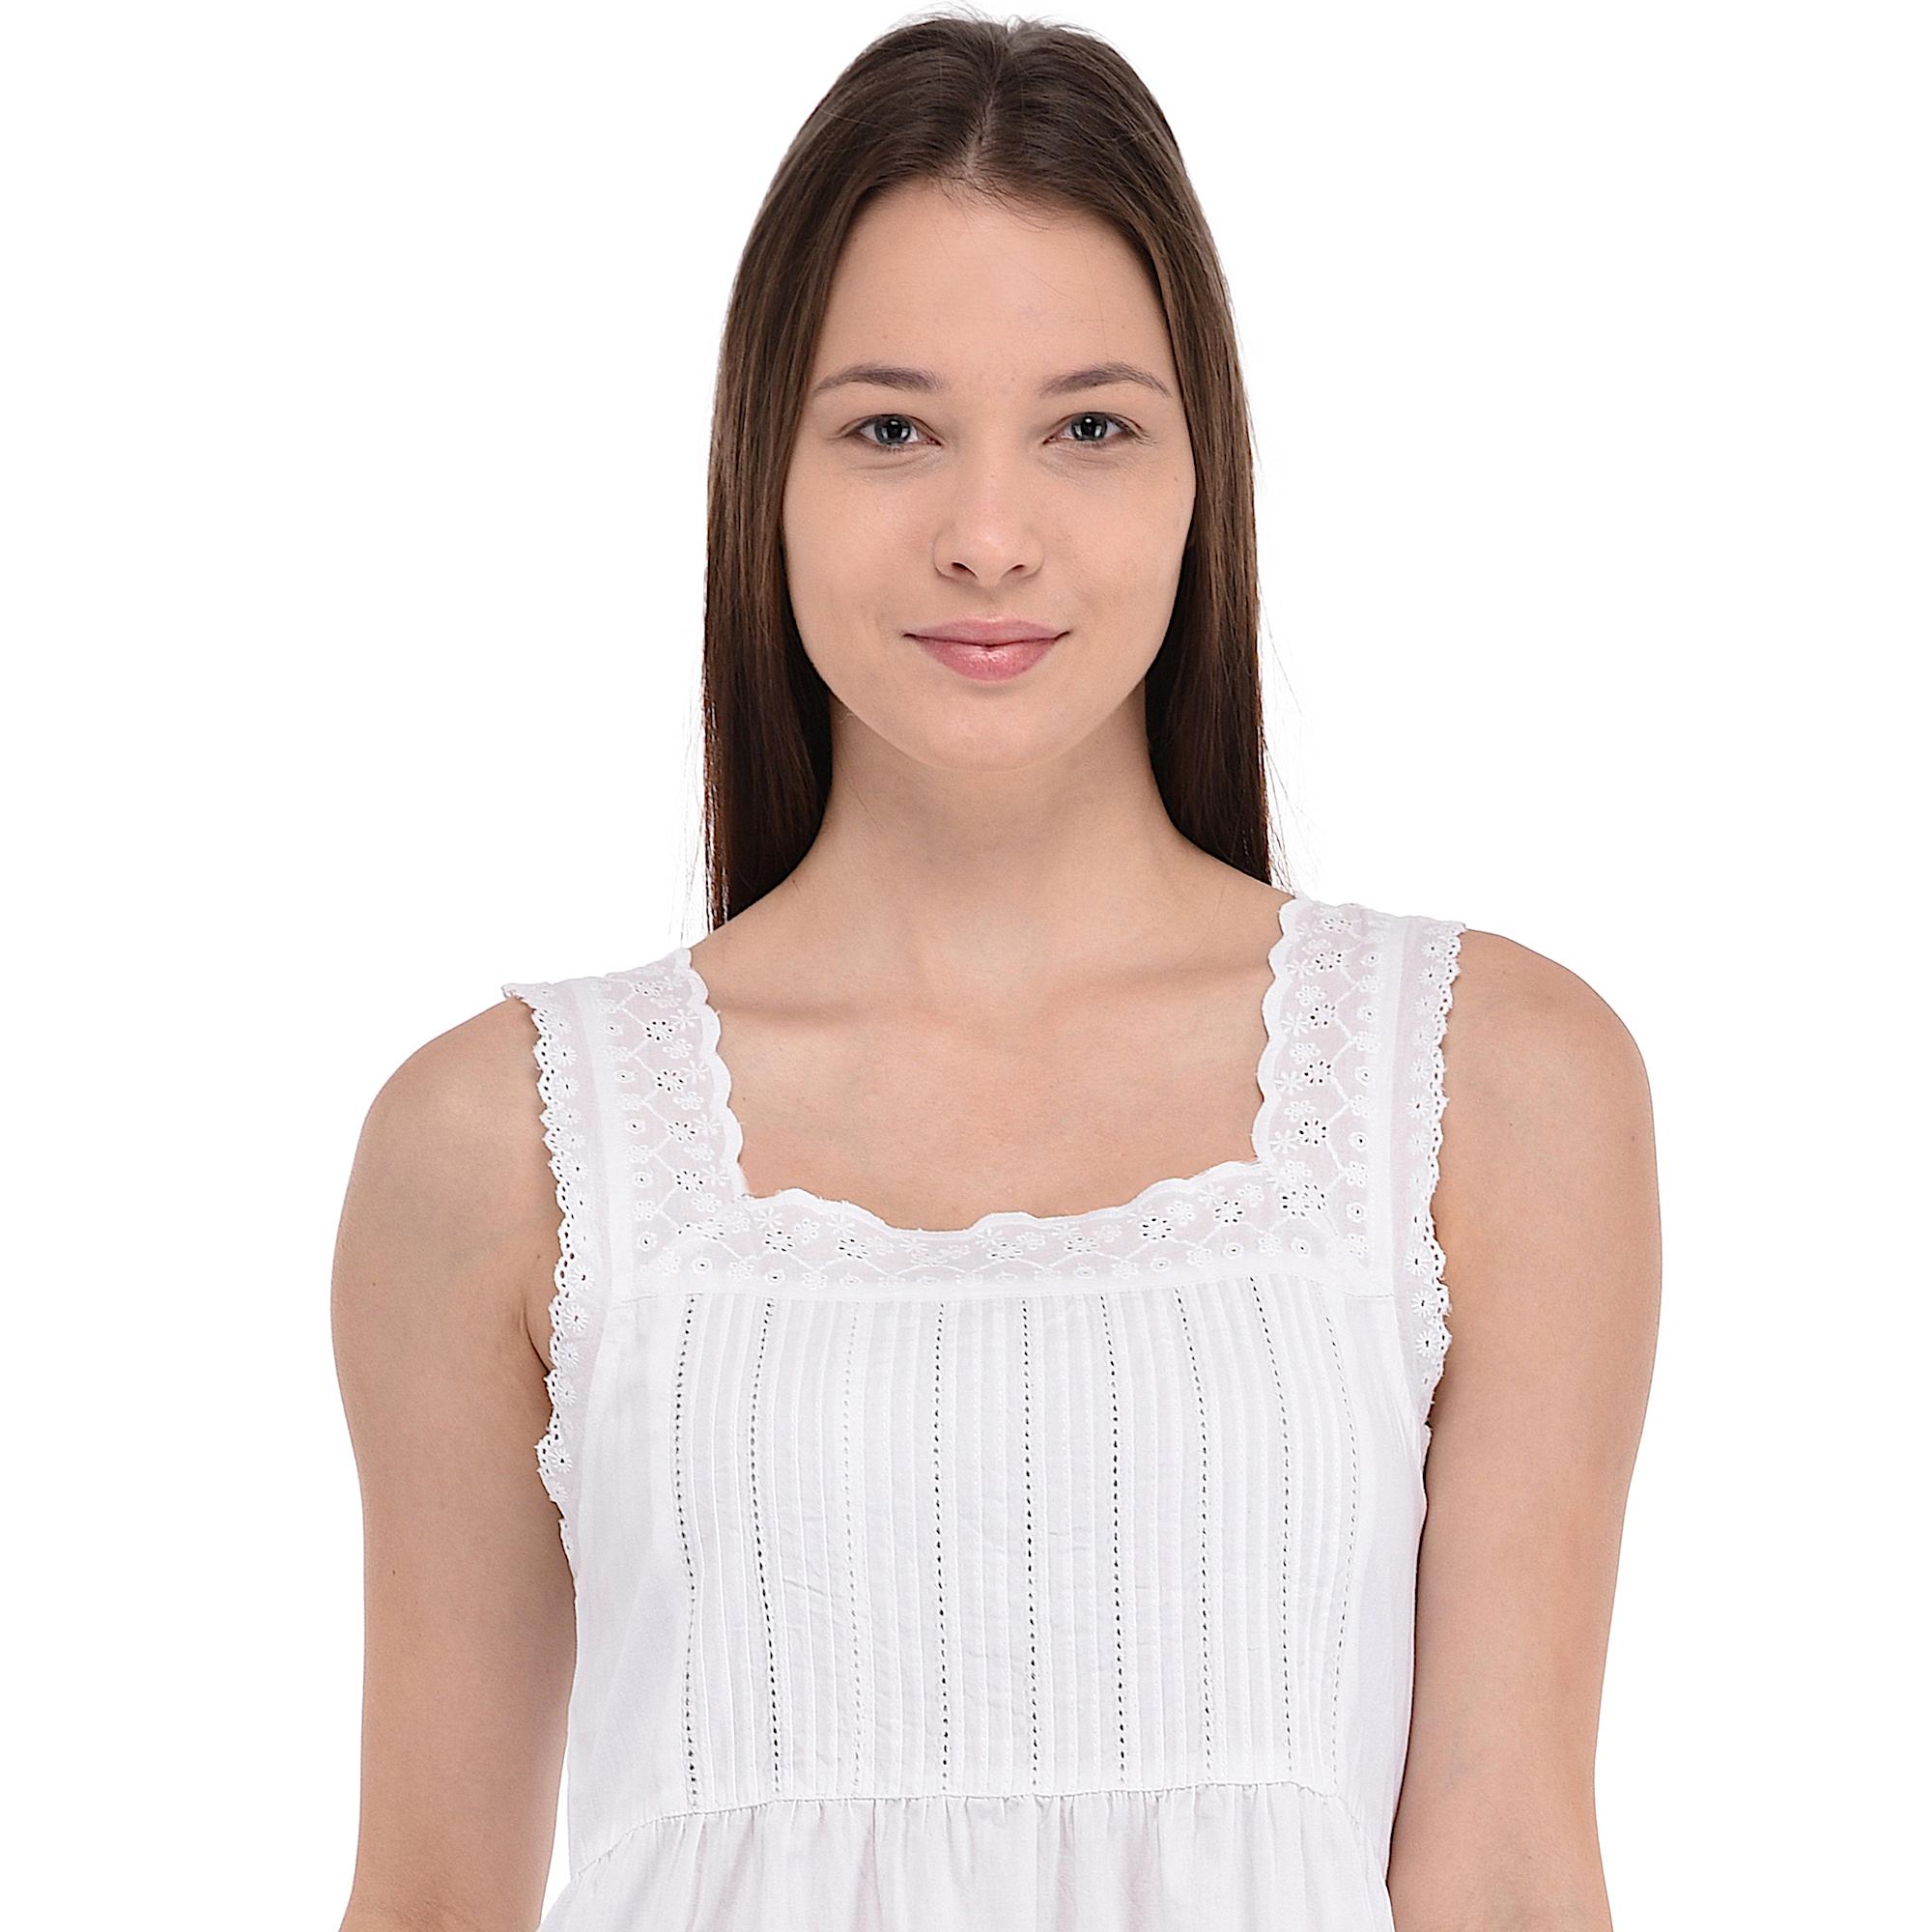 72cbd6d9f7 White Sleeveless Classic Nightdress